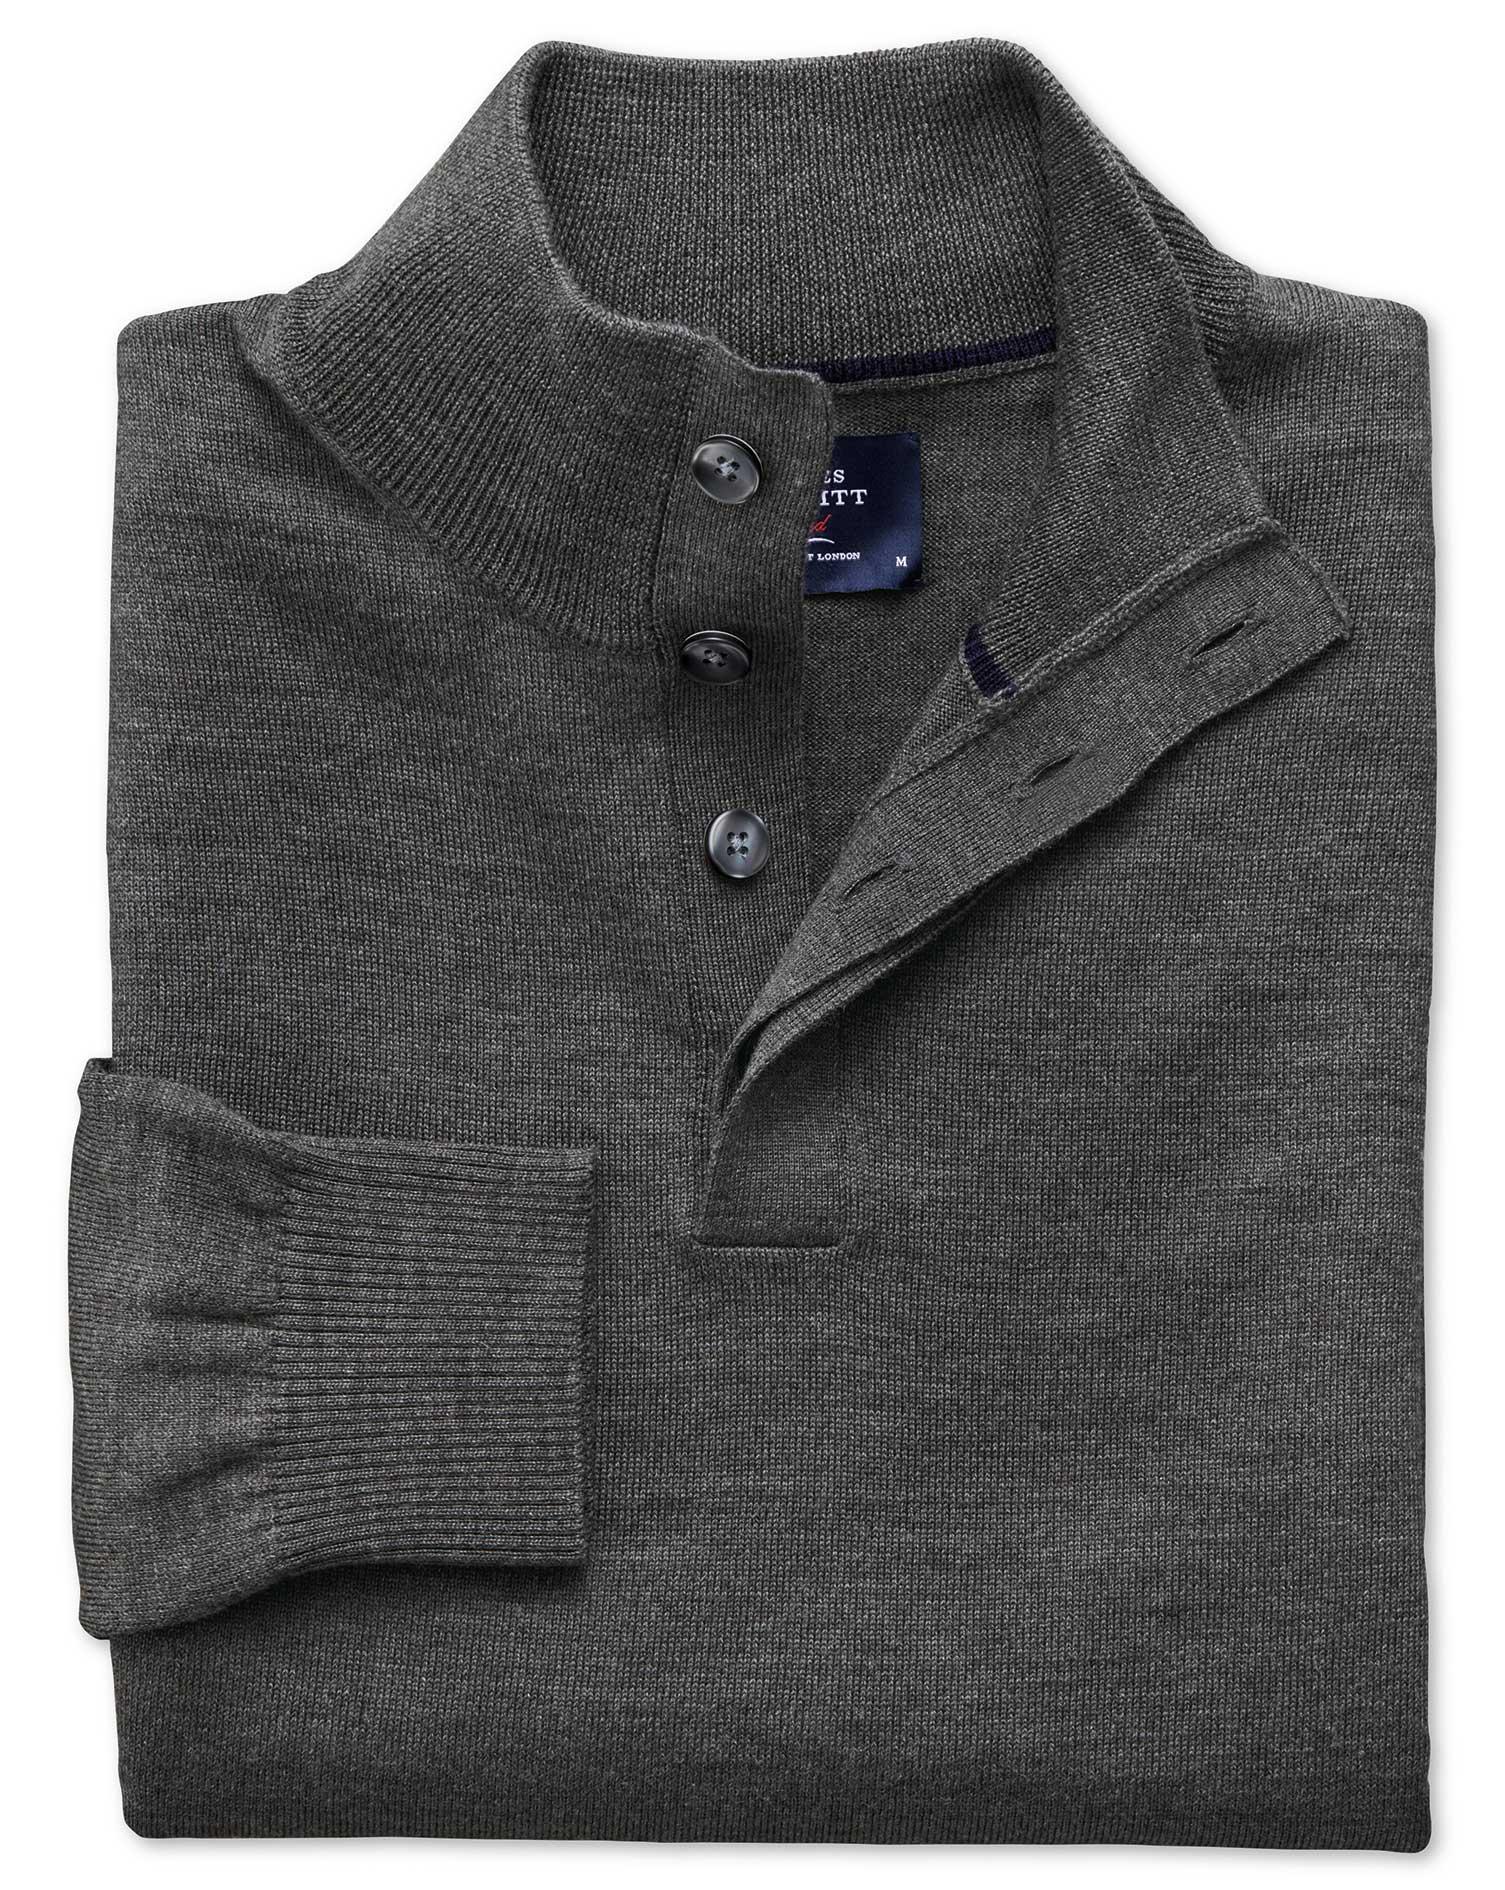 Charcoal Merino Wool Button Neck Jumper Size XXL by Charles Tyrwhitt